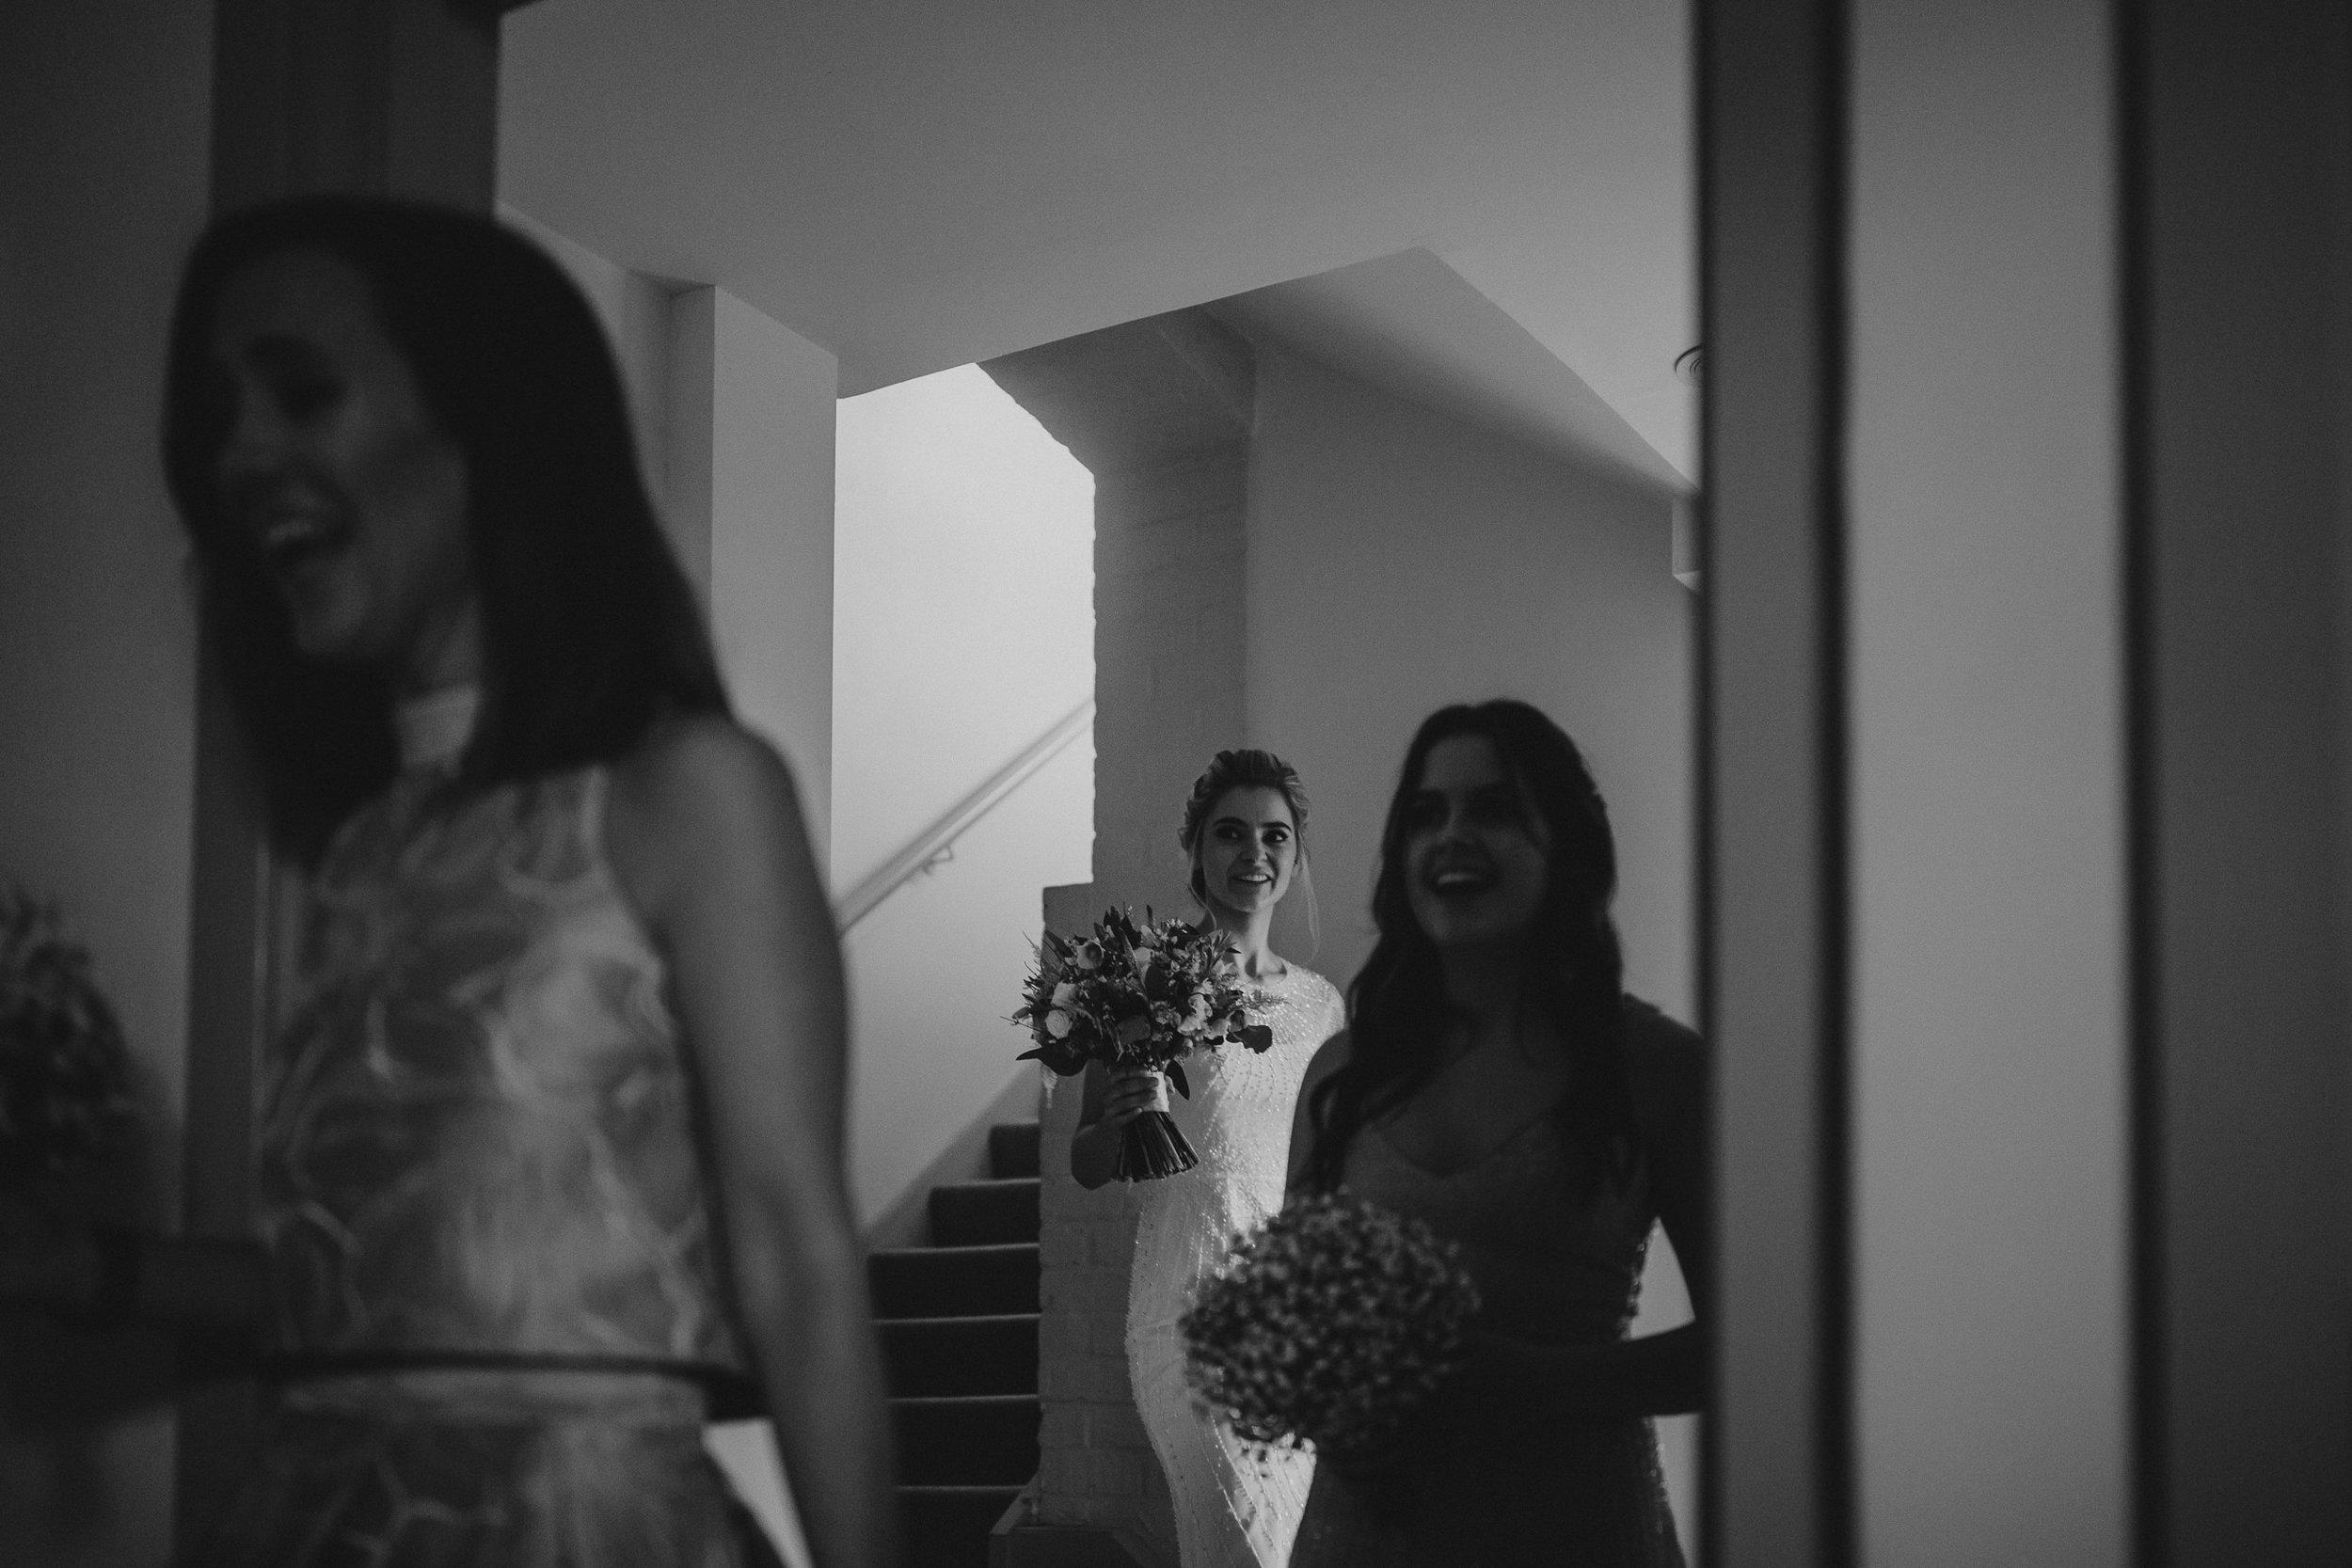 London_wedding_photographer_gione_da_silva_carelle_paul105.jpg